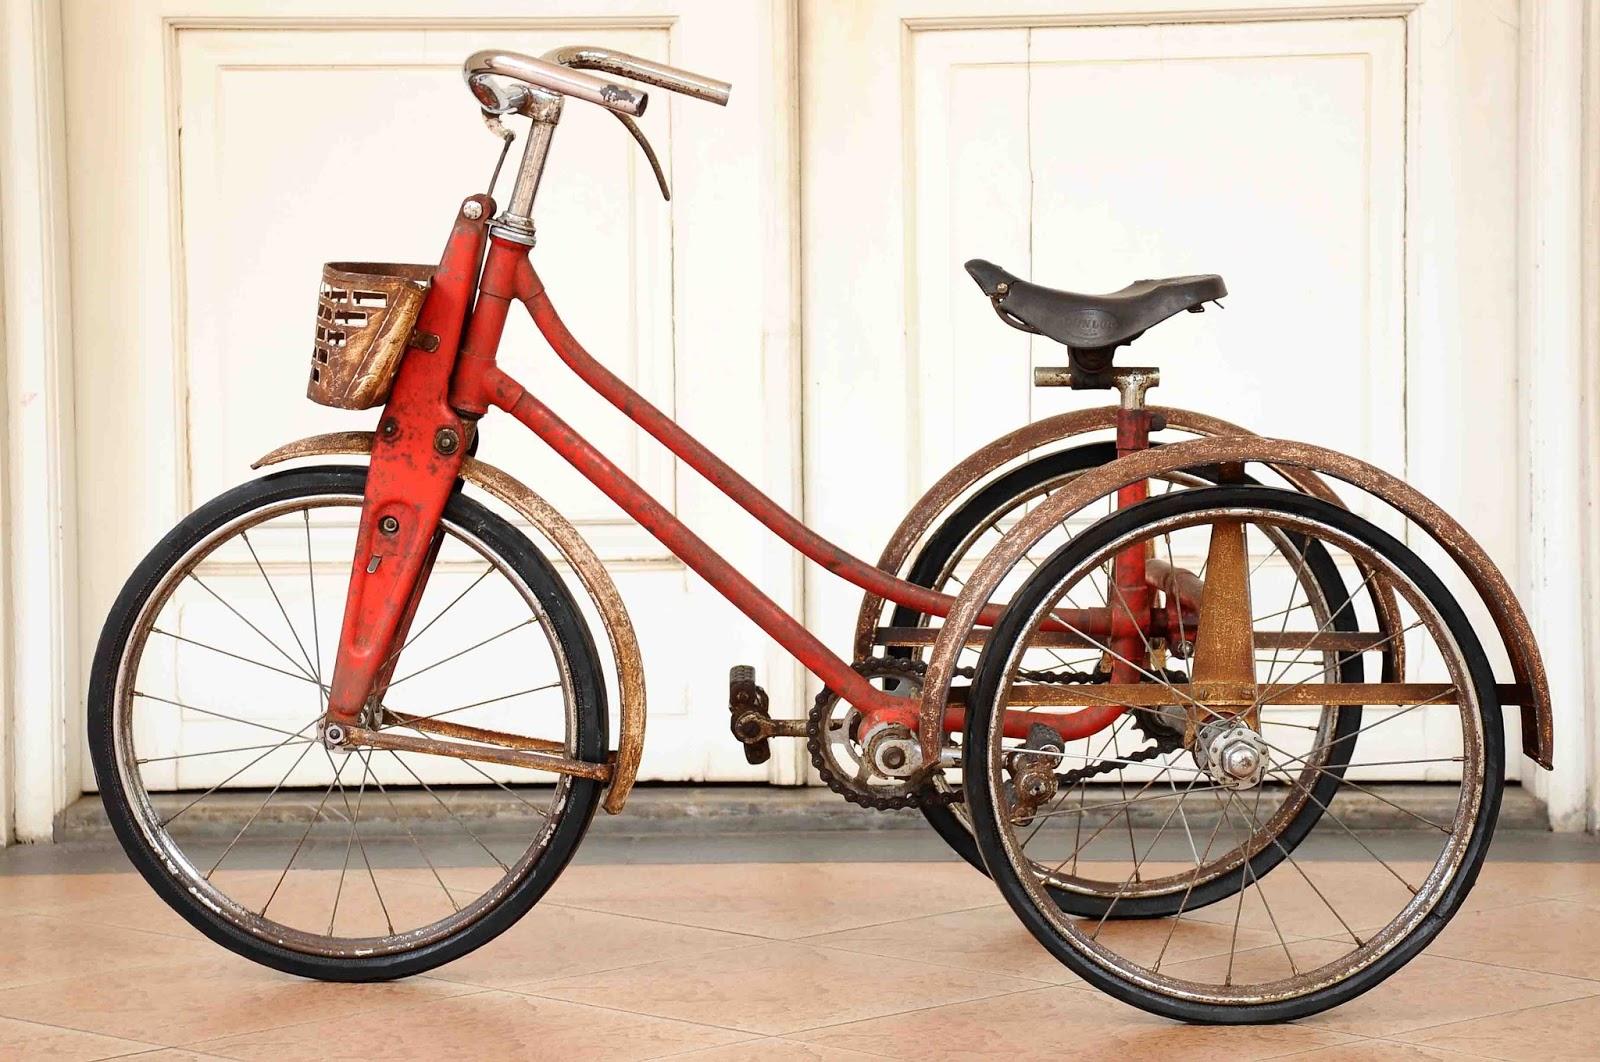 Old Vintage Gallery: Vintage Raleigh Tricycle made in